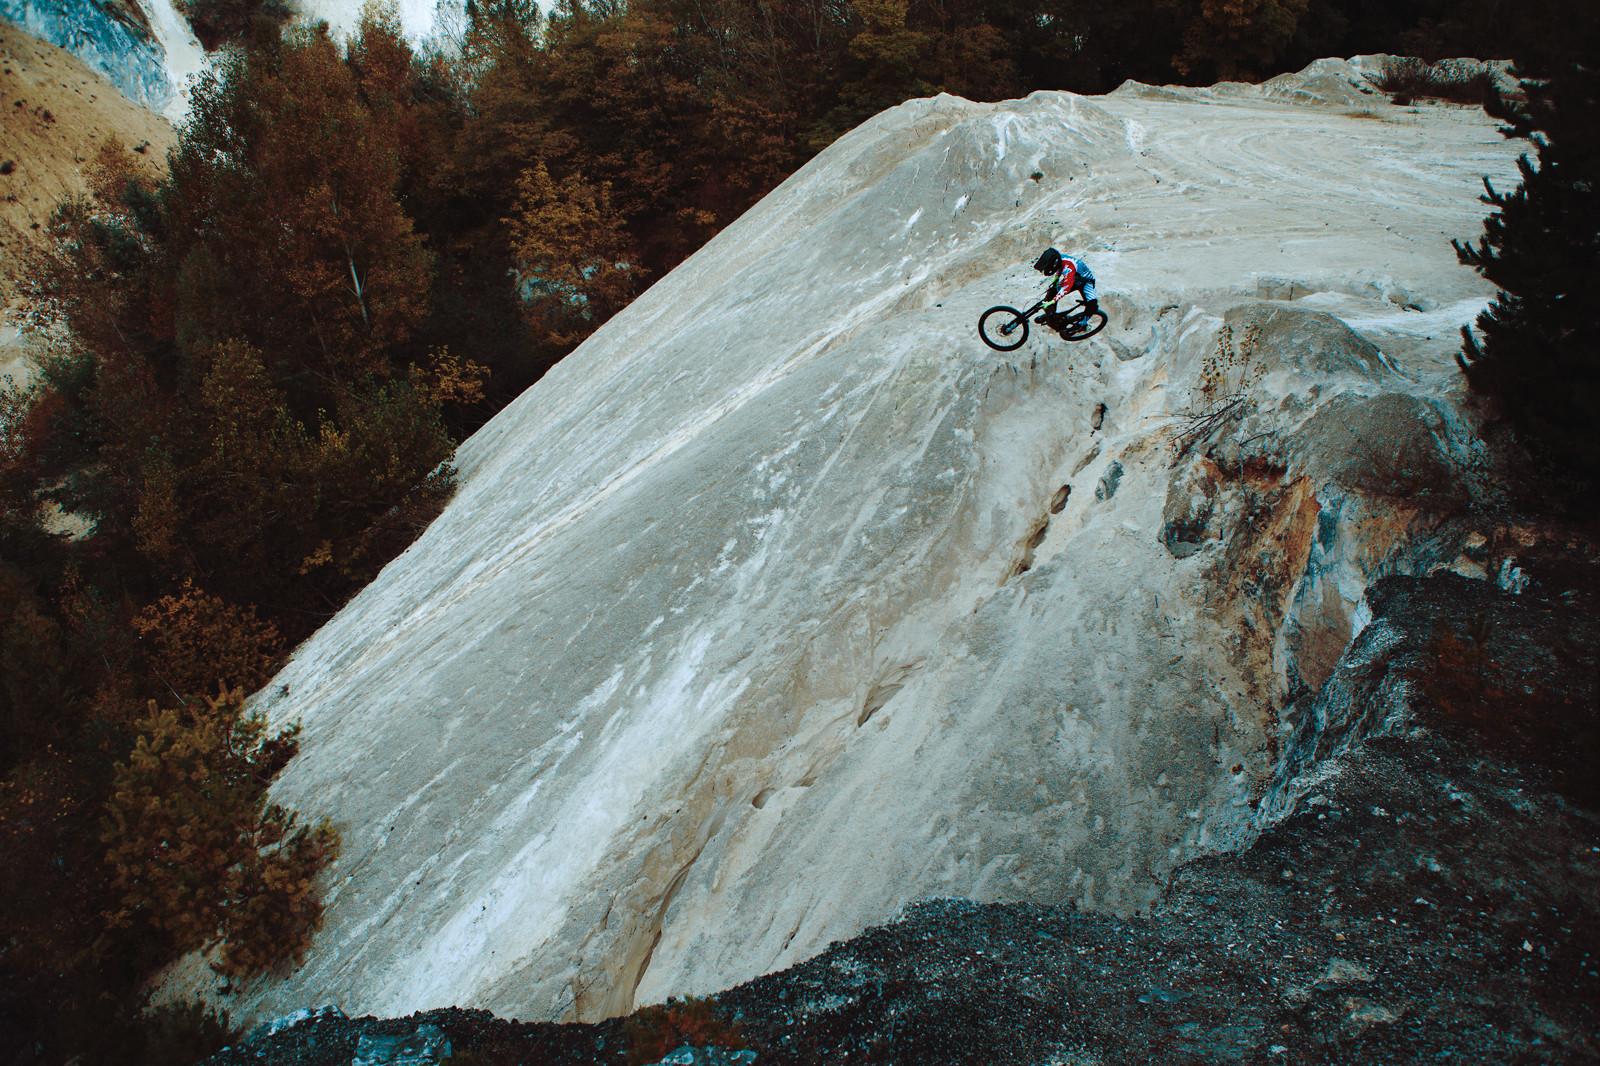 Beres - EWIA - Mountain Biking Pictures - Vital MTB